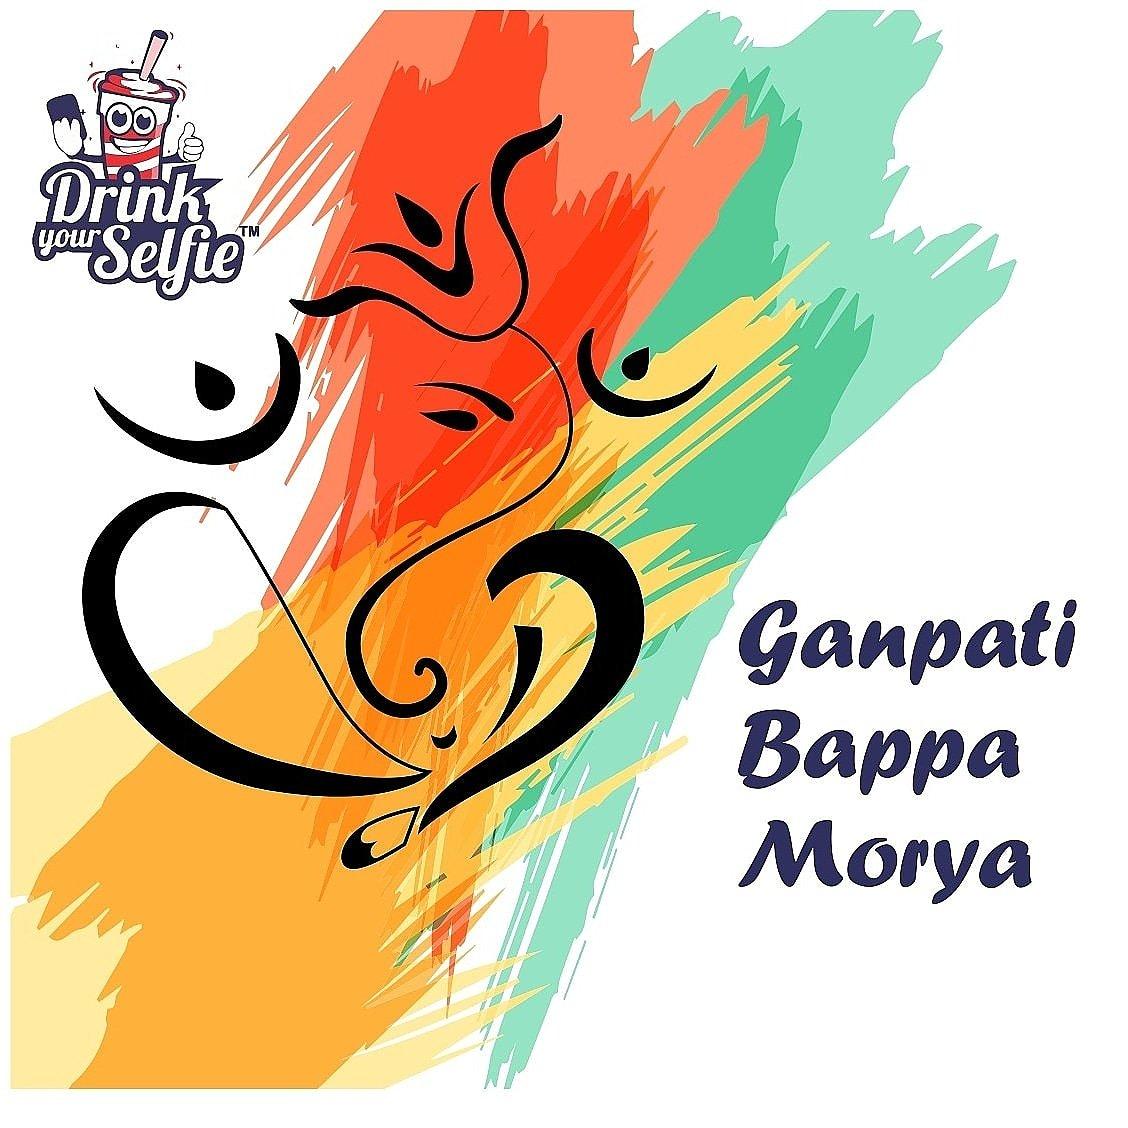 @DrinkYourSelfie pray that Ganesha bestows you with happiness, wisdom, good health and prosperity! #DrinkYourSelfie #GaneshChaturthi2019 #coffeeculture #coffee #foodie #foodphotographer #foodphotography #festiveseason #indianwear #indianfashion #ganesha #ichalkaranji #fistival